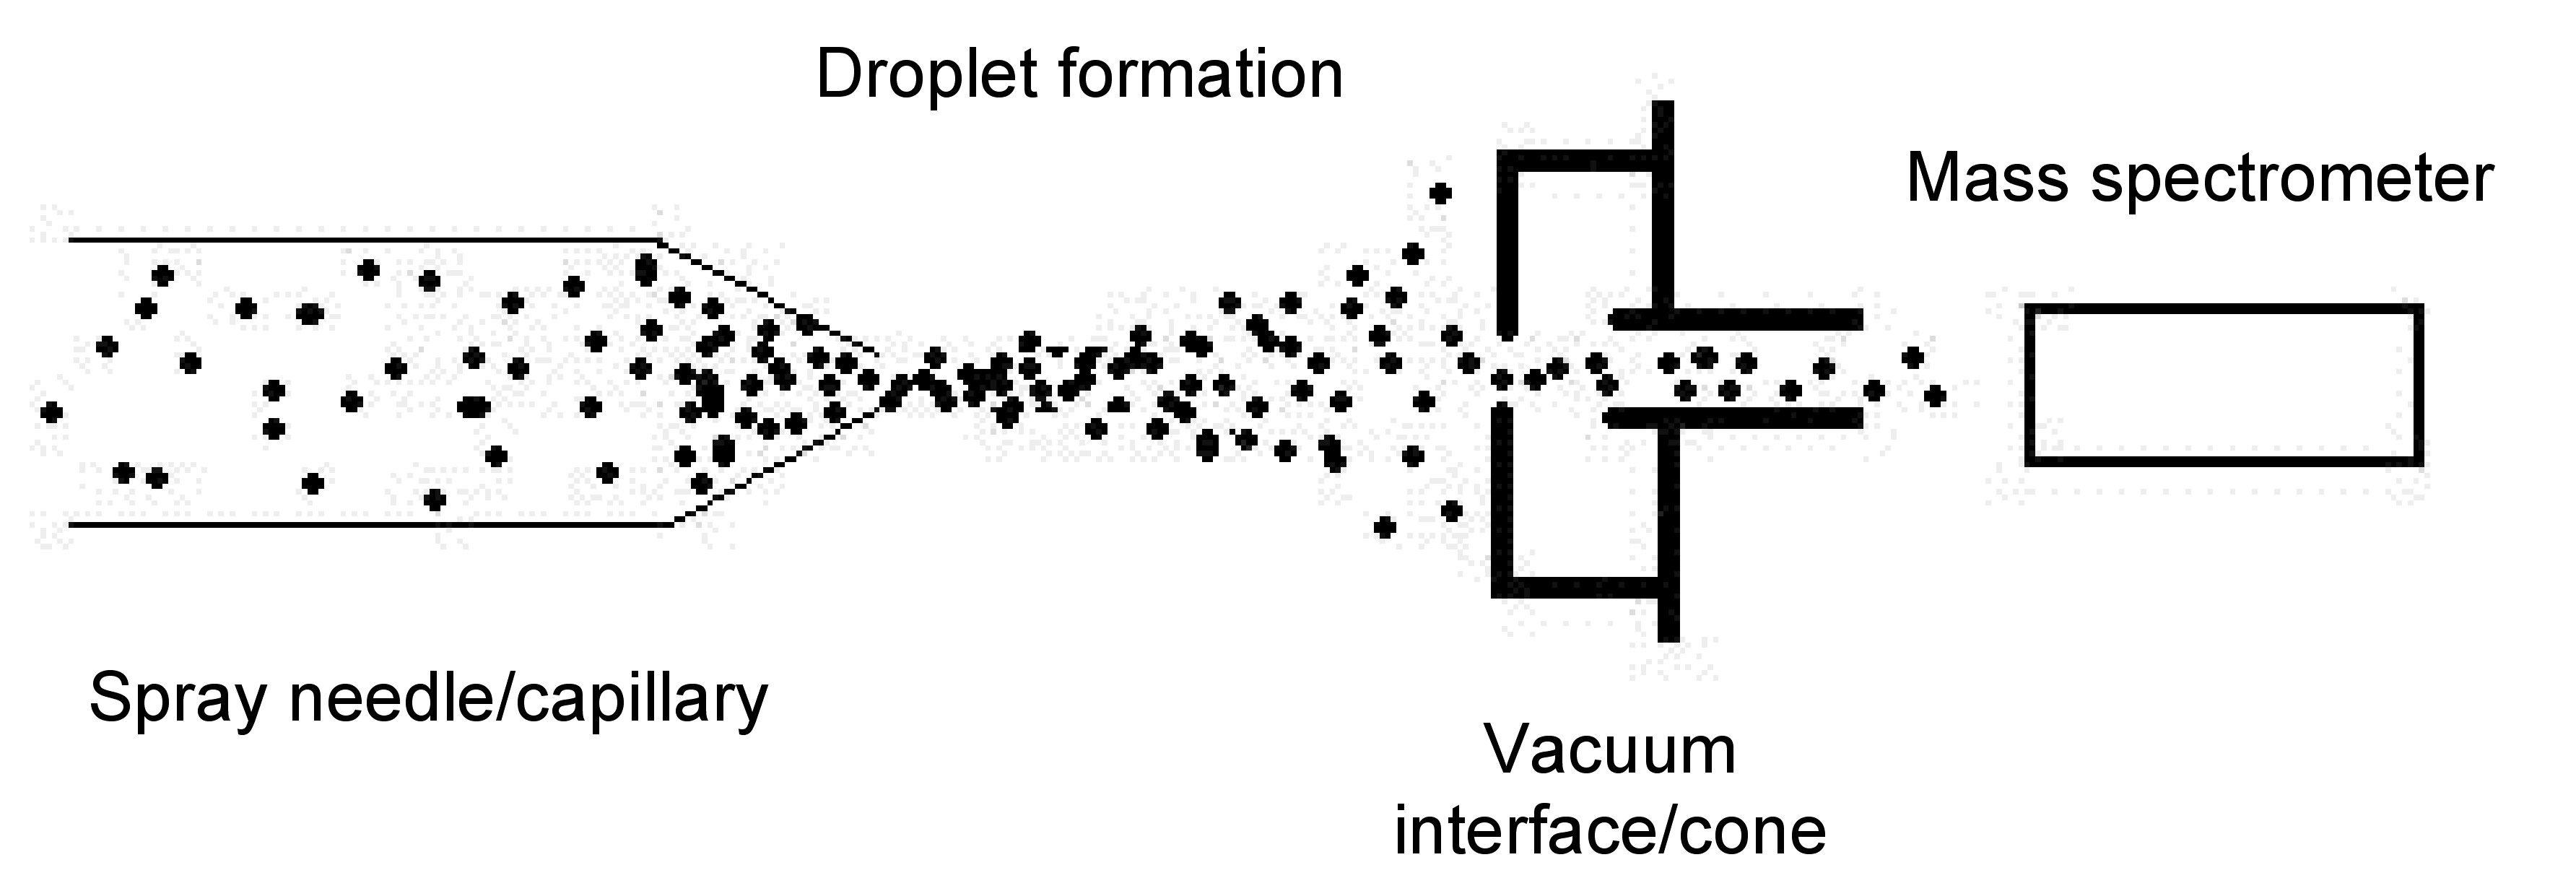 Proteinysis Using Electrospray Ionization Mass